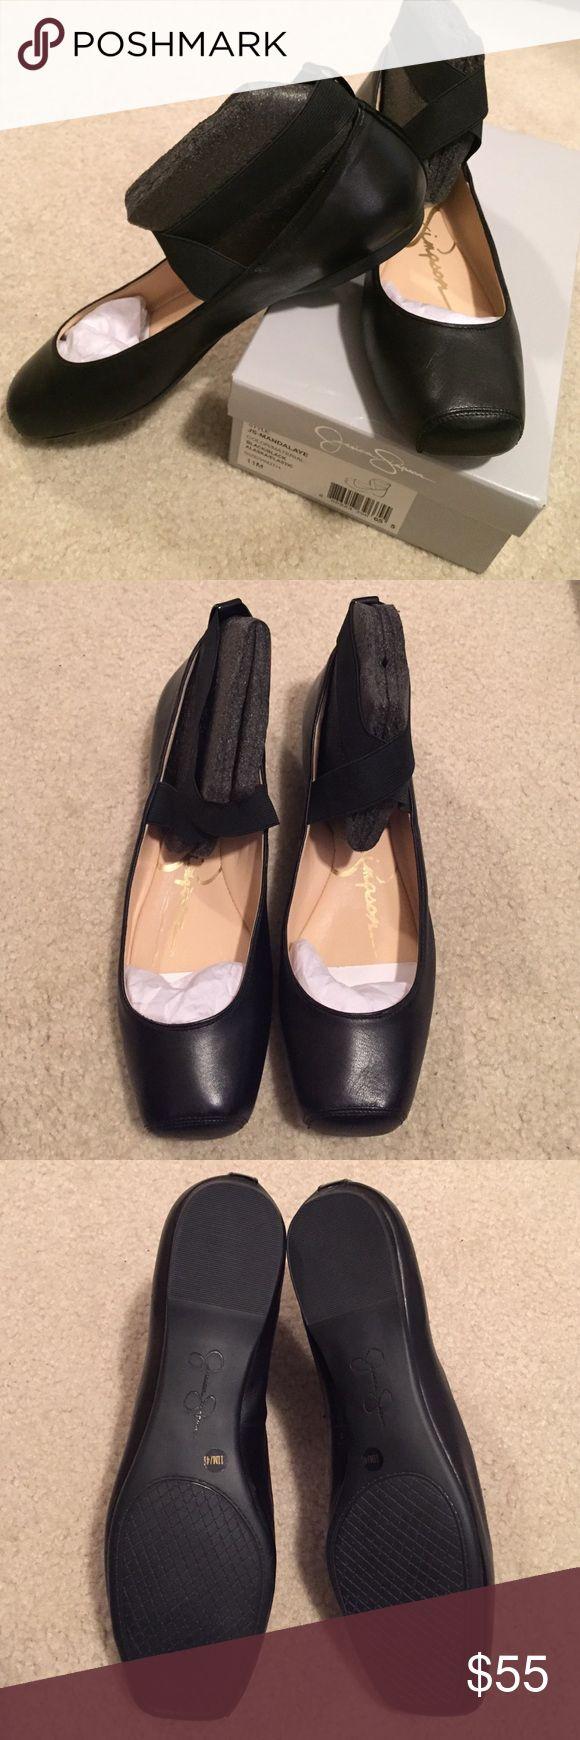 BNWT Jessica Simpson Mandalaye BNWT Jessica Simpson Mandalaye ballet shoes in size 11. Jessica Simpson Shoes Flats & Loafers